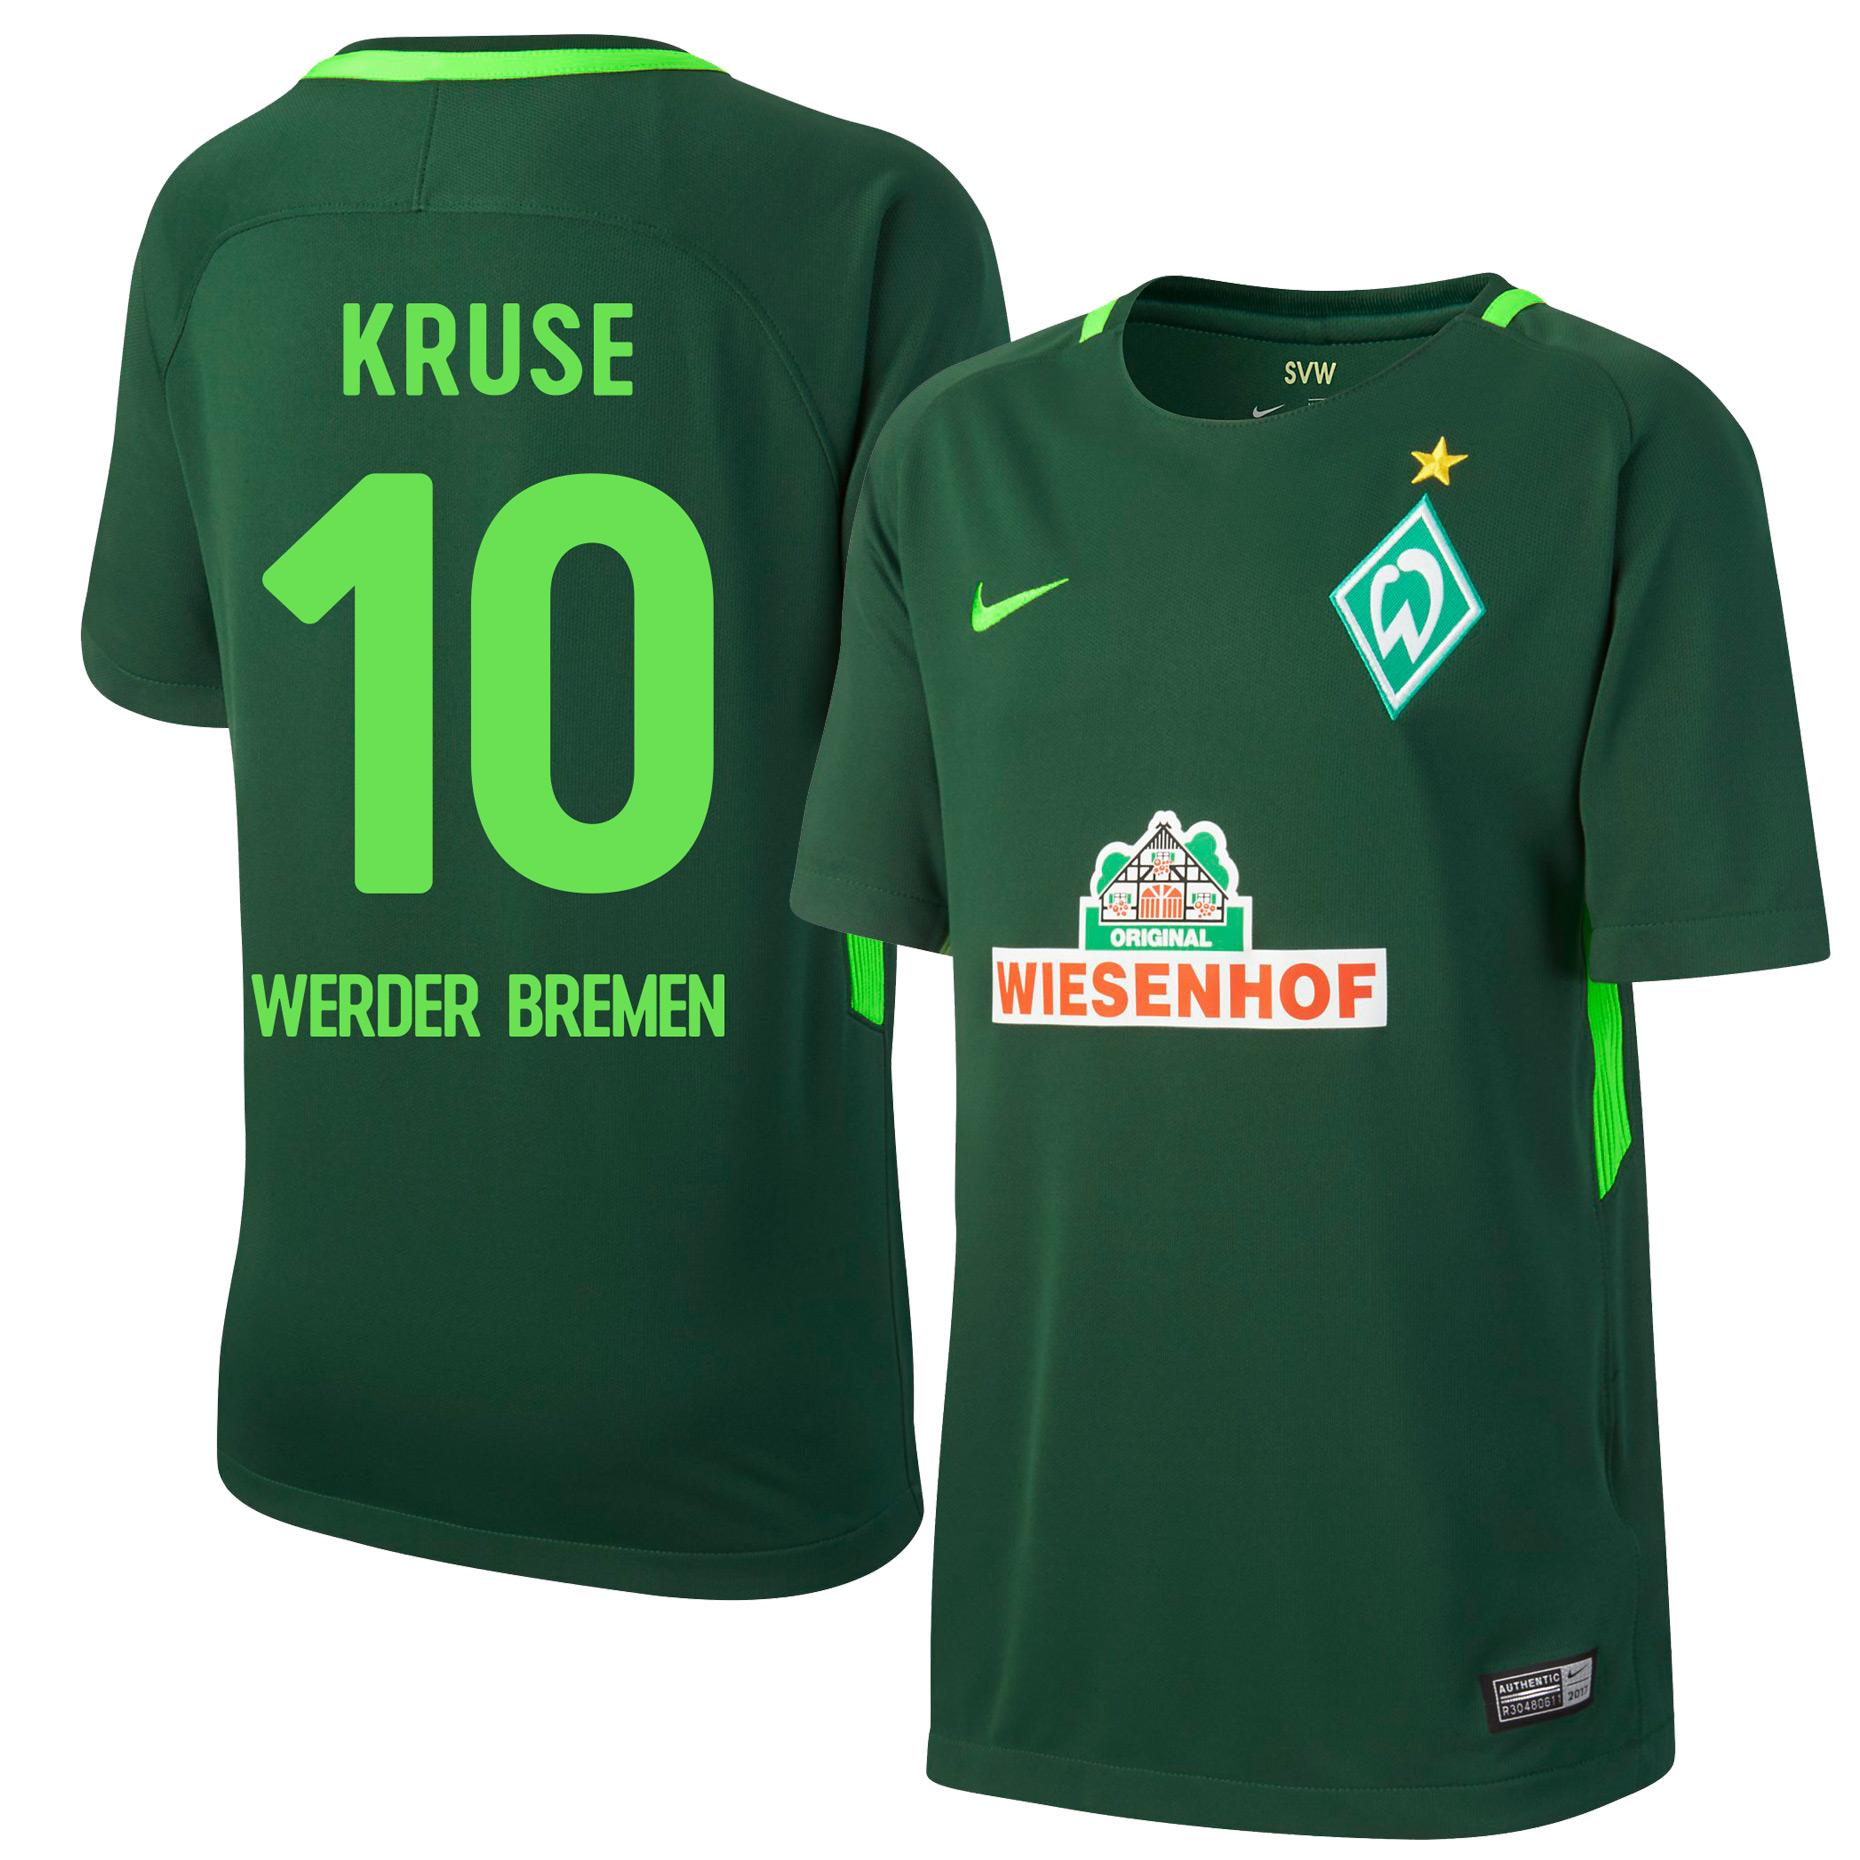 Werder Bremen Home Kruse Jersey 2017 / 2018 (Fan Style Printing) - M